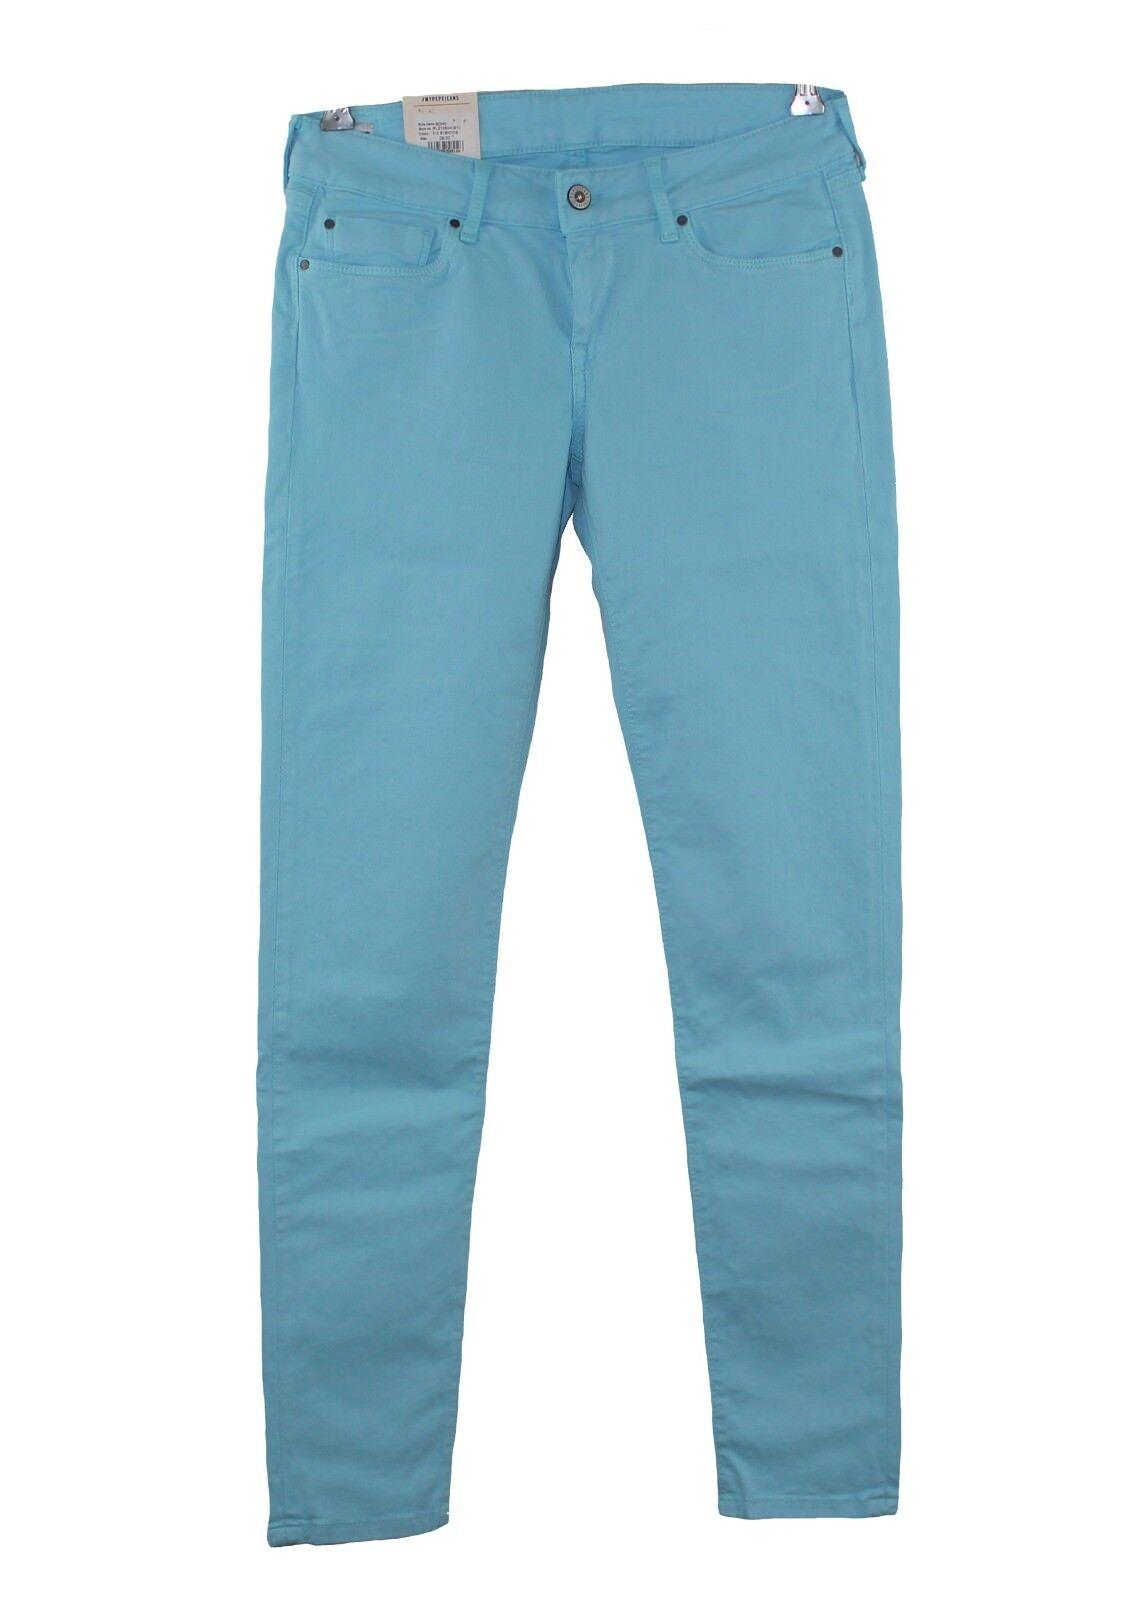 Pepe Jeans - SOHO SOHO Eventide